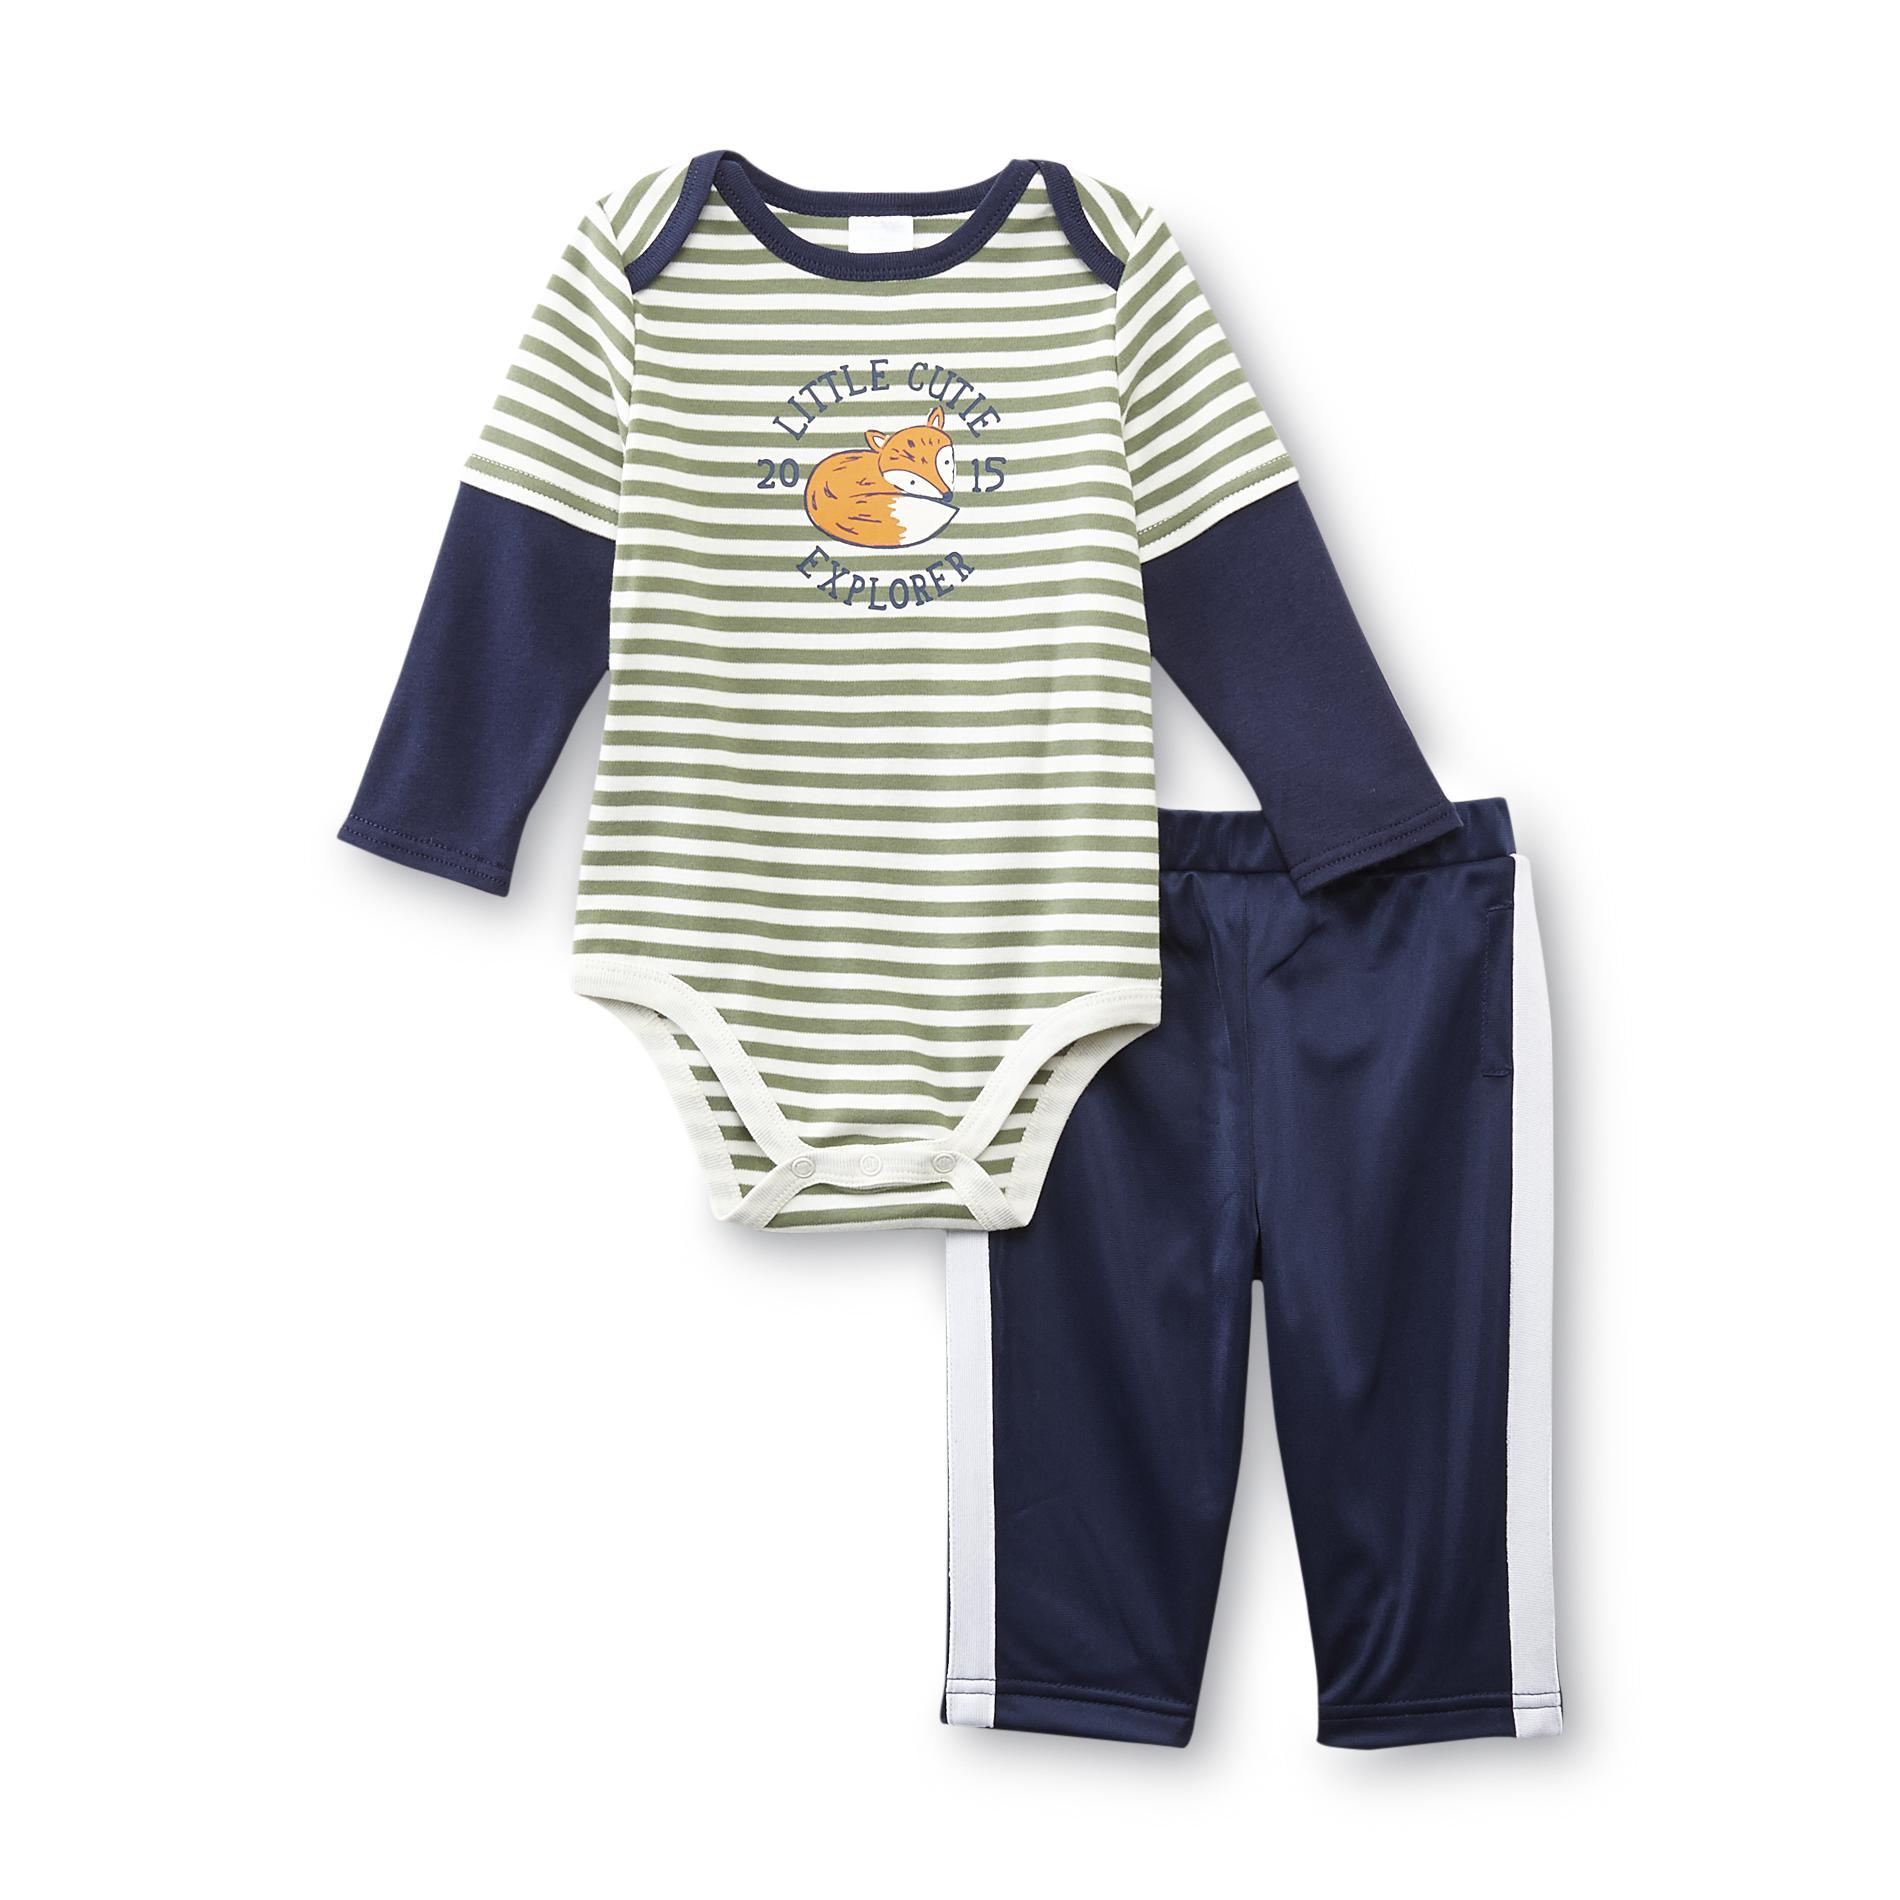 Small Wonders Newborn Boy's Bodysuit & Track Pants - Striped & Fox